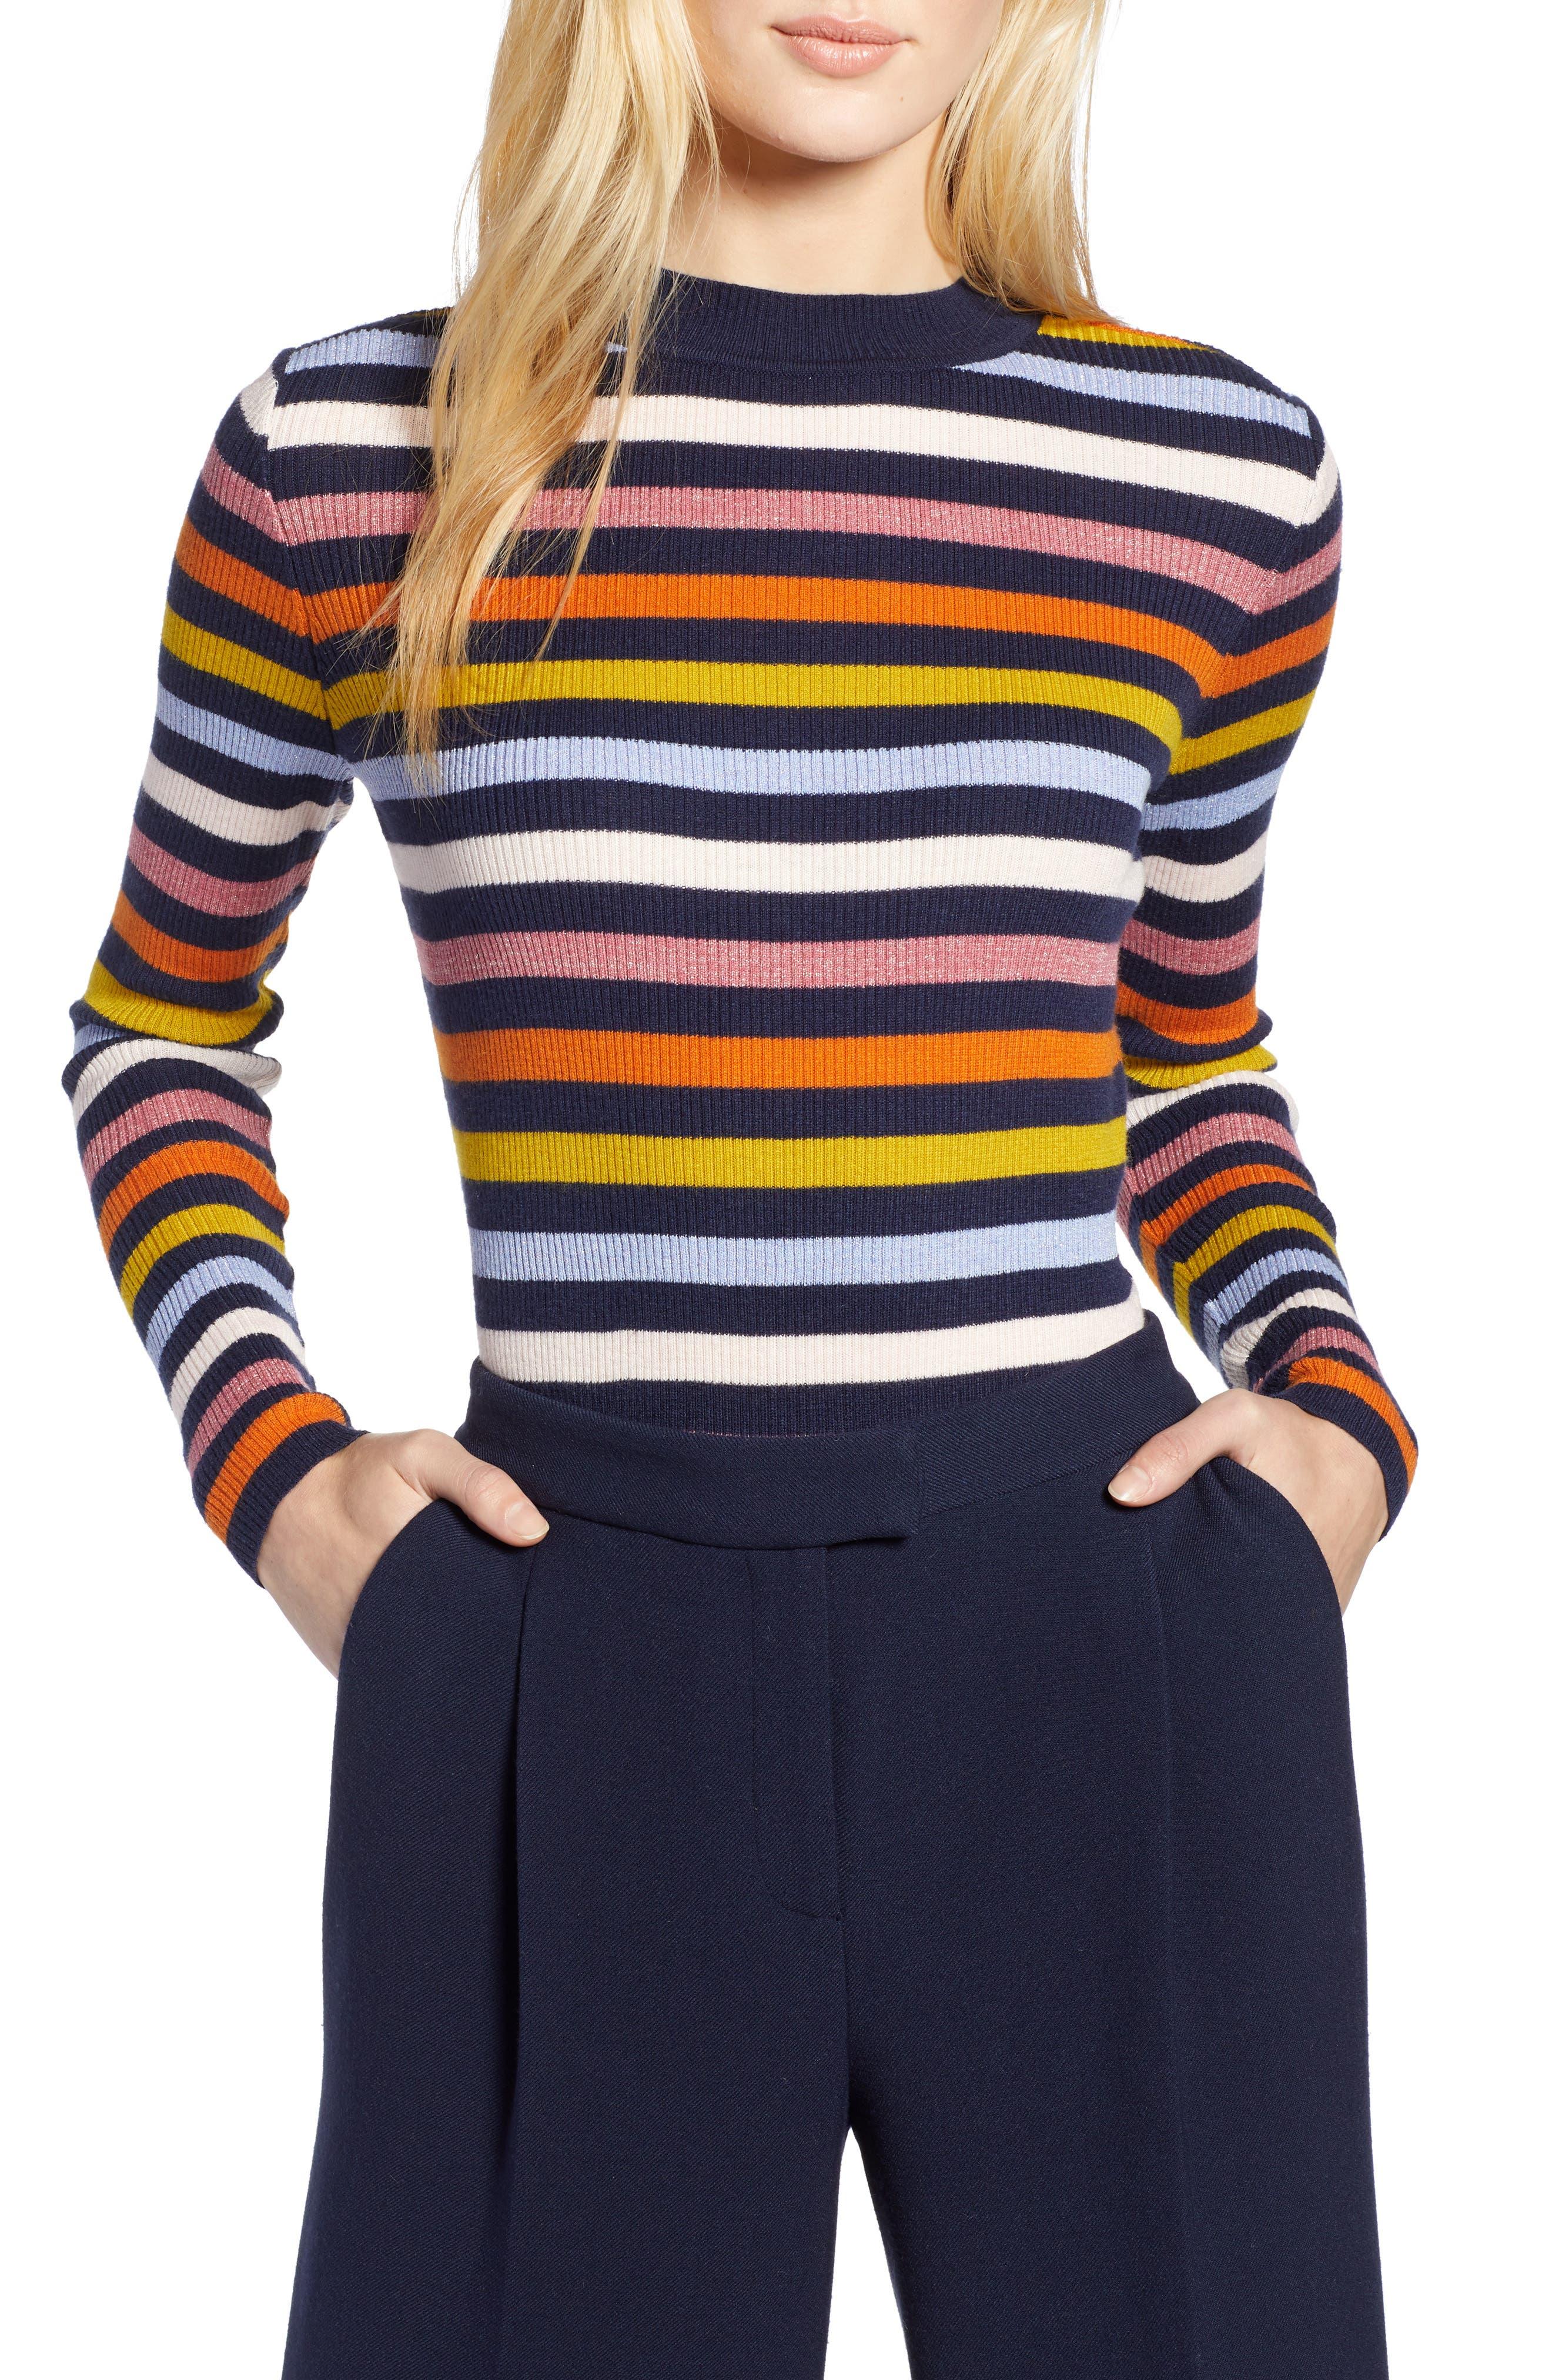 x Atlantic-Pacific Shimmer Stripe Sweater,                             Main thumbnail 1, color,                             NAVY MULTI STRIPE